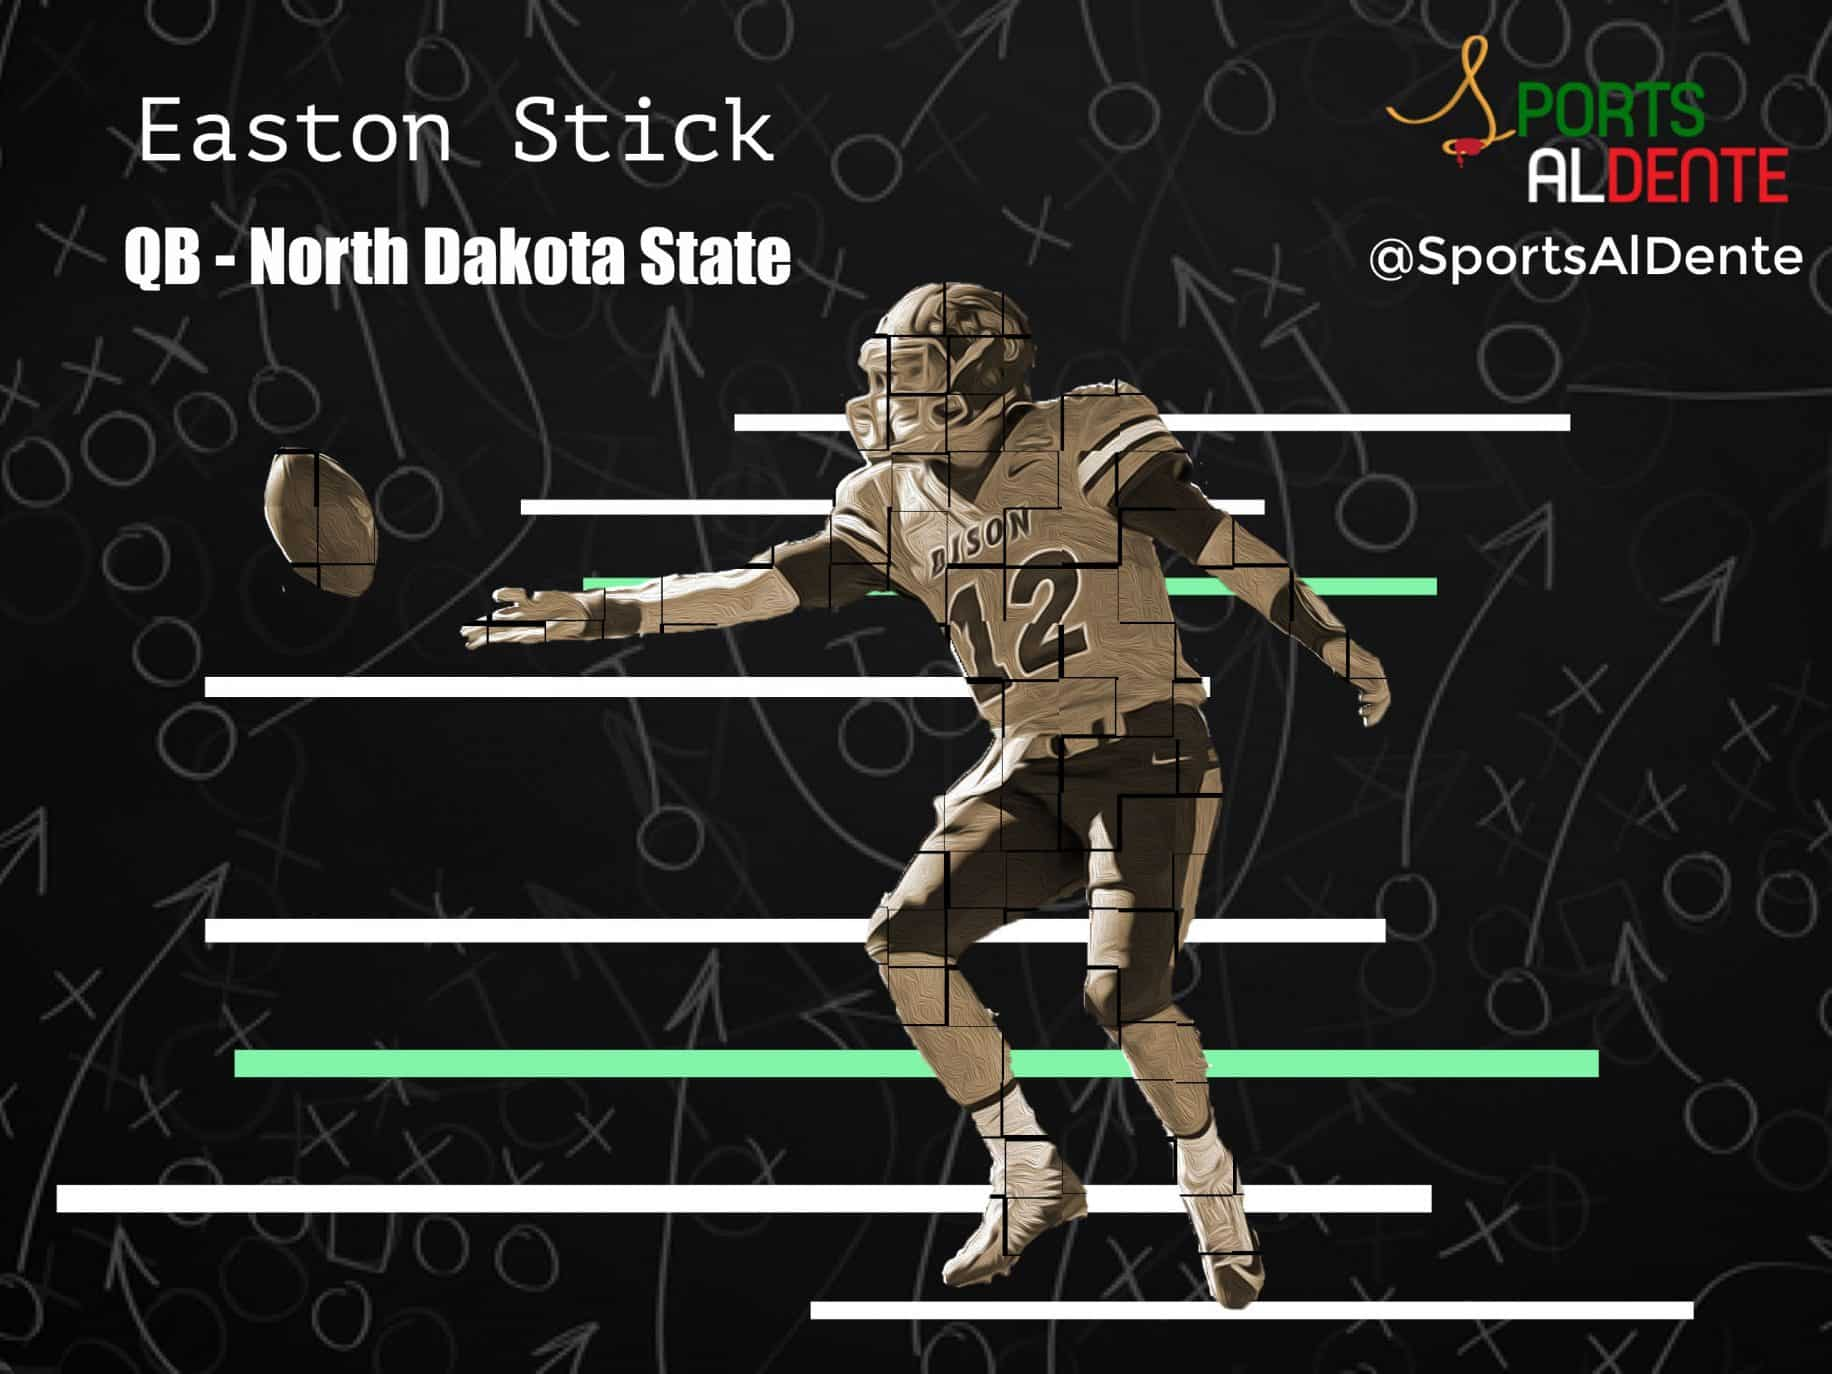 Easton Stick NFL Draft Profile